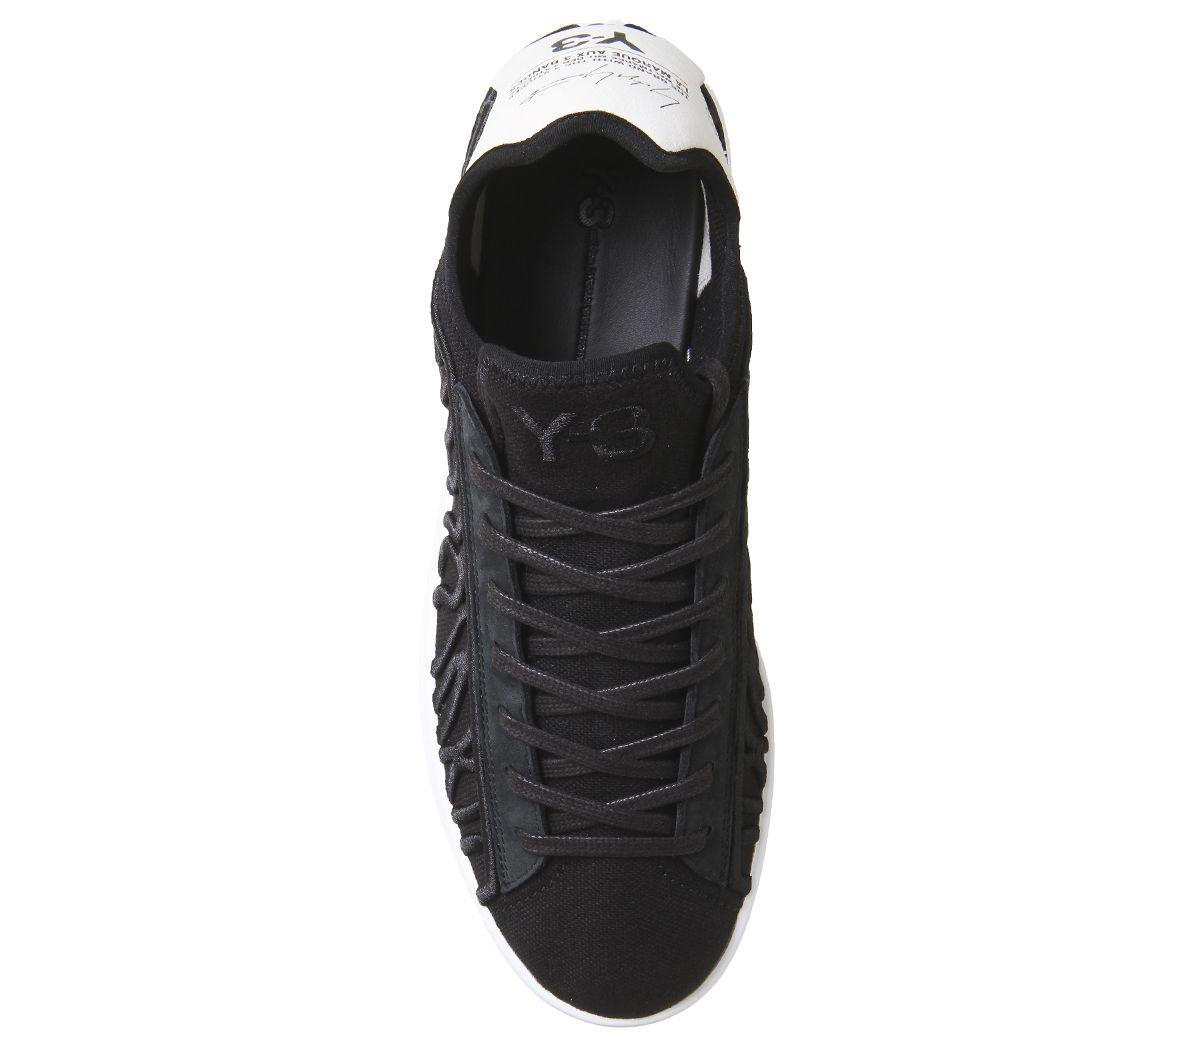 Y-3 Denim Y-3 Shishu Stan in Black White (Black)